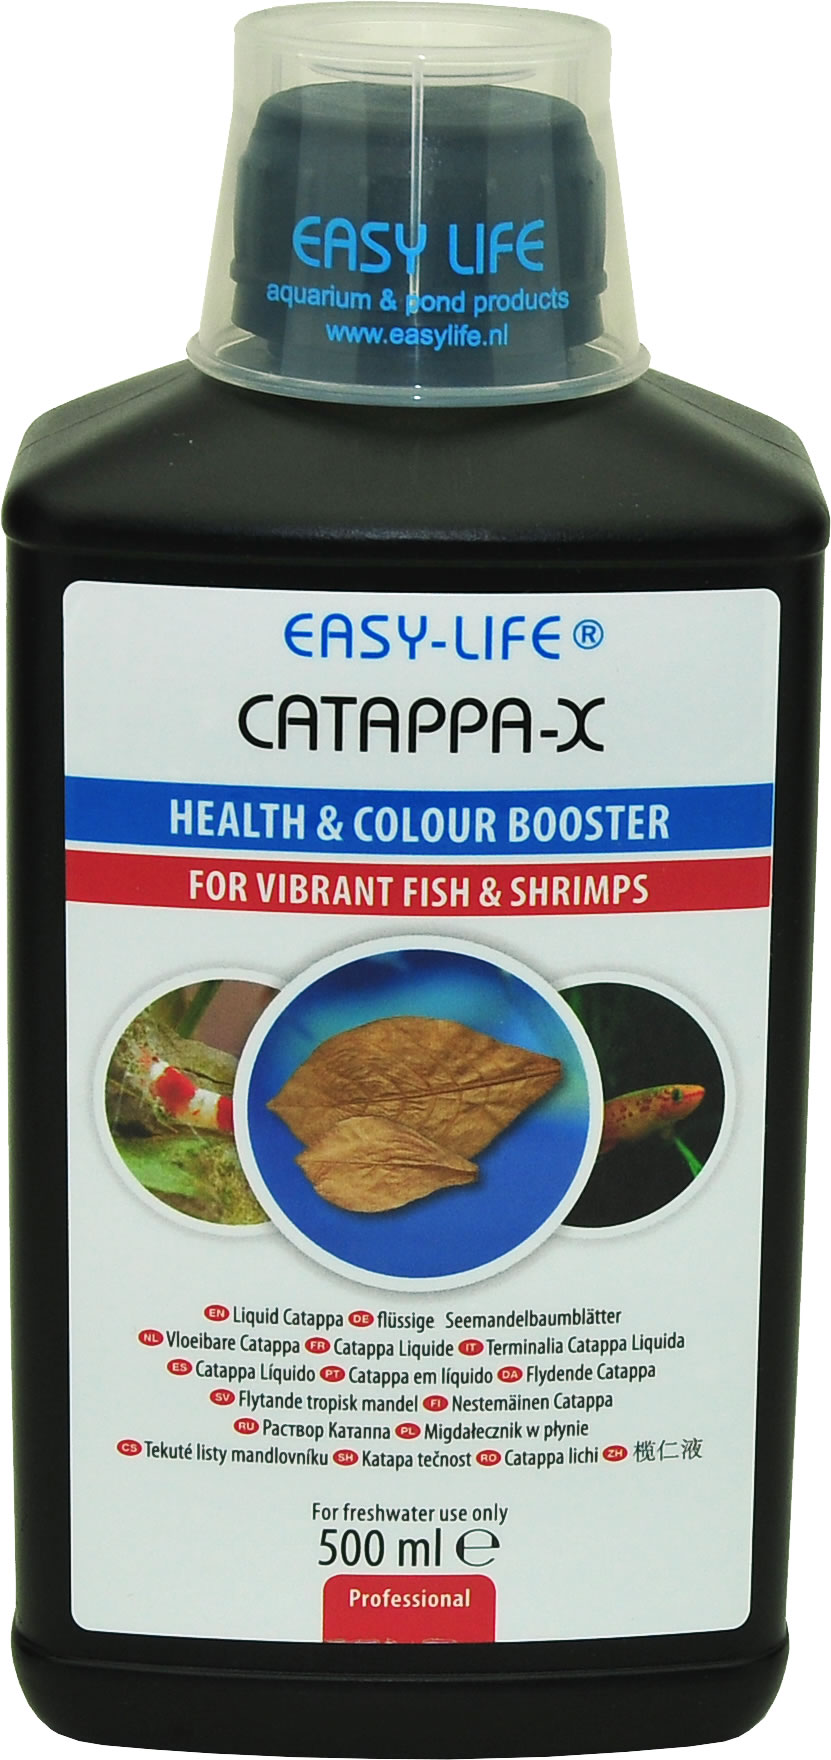 Easy Life Easy-Life Catappa-X